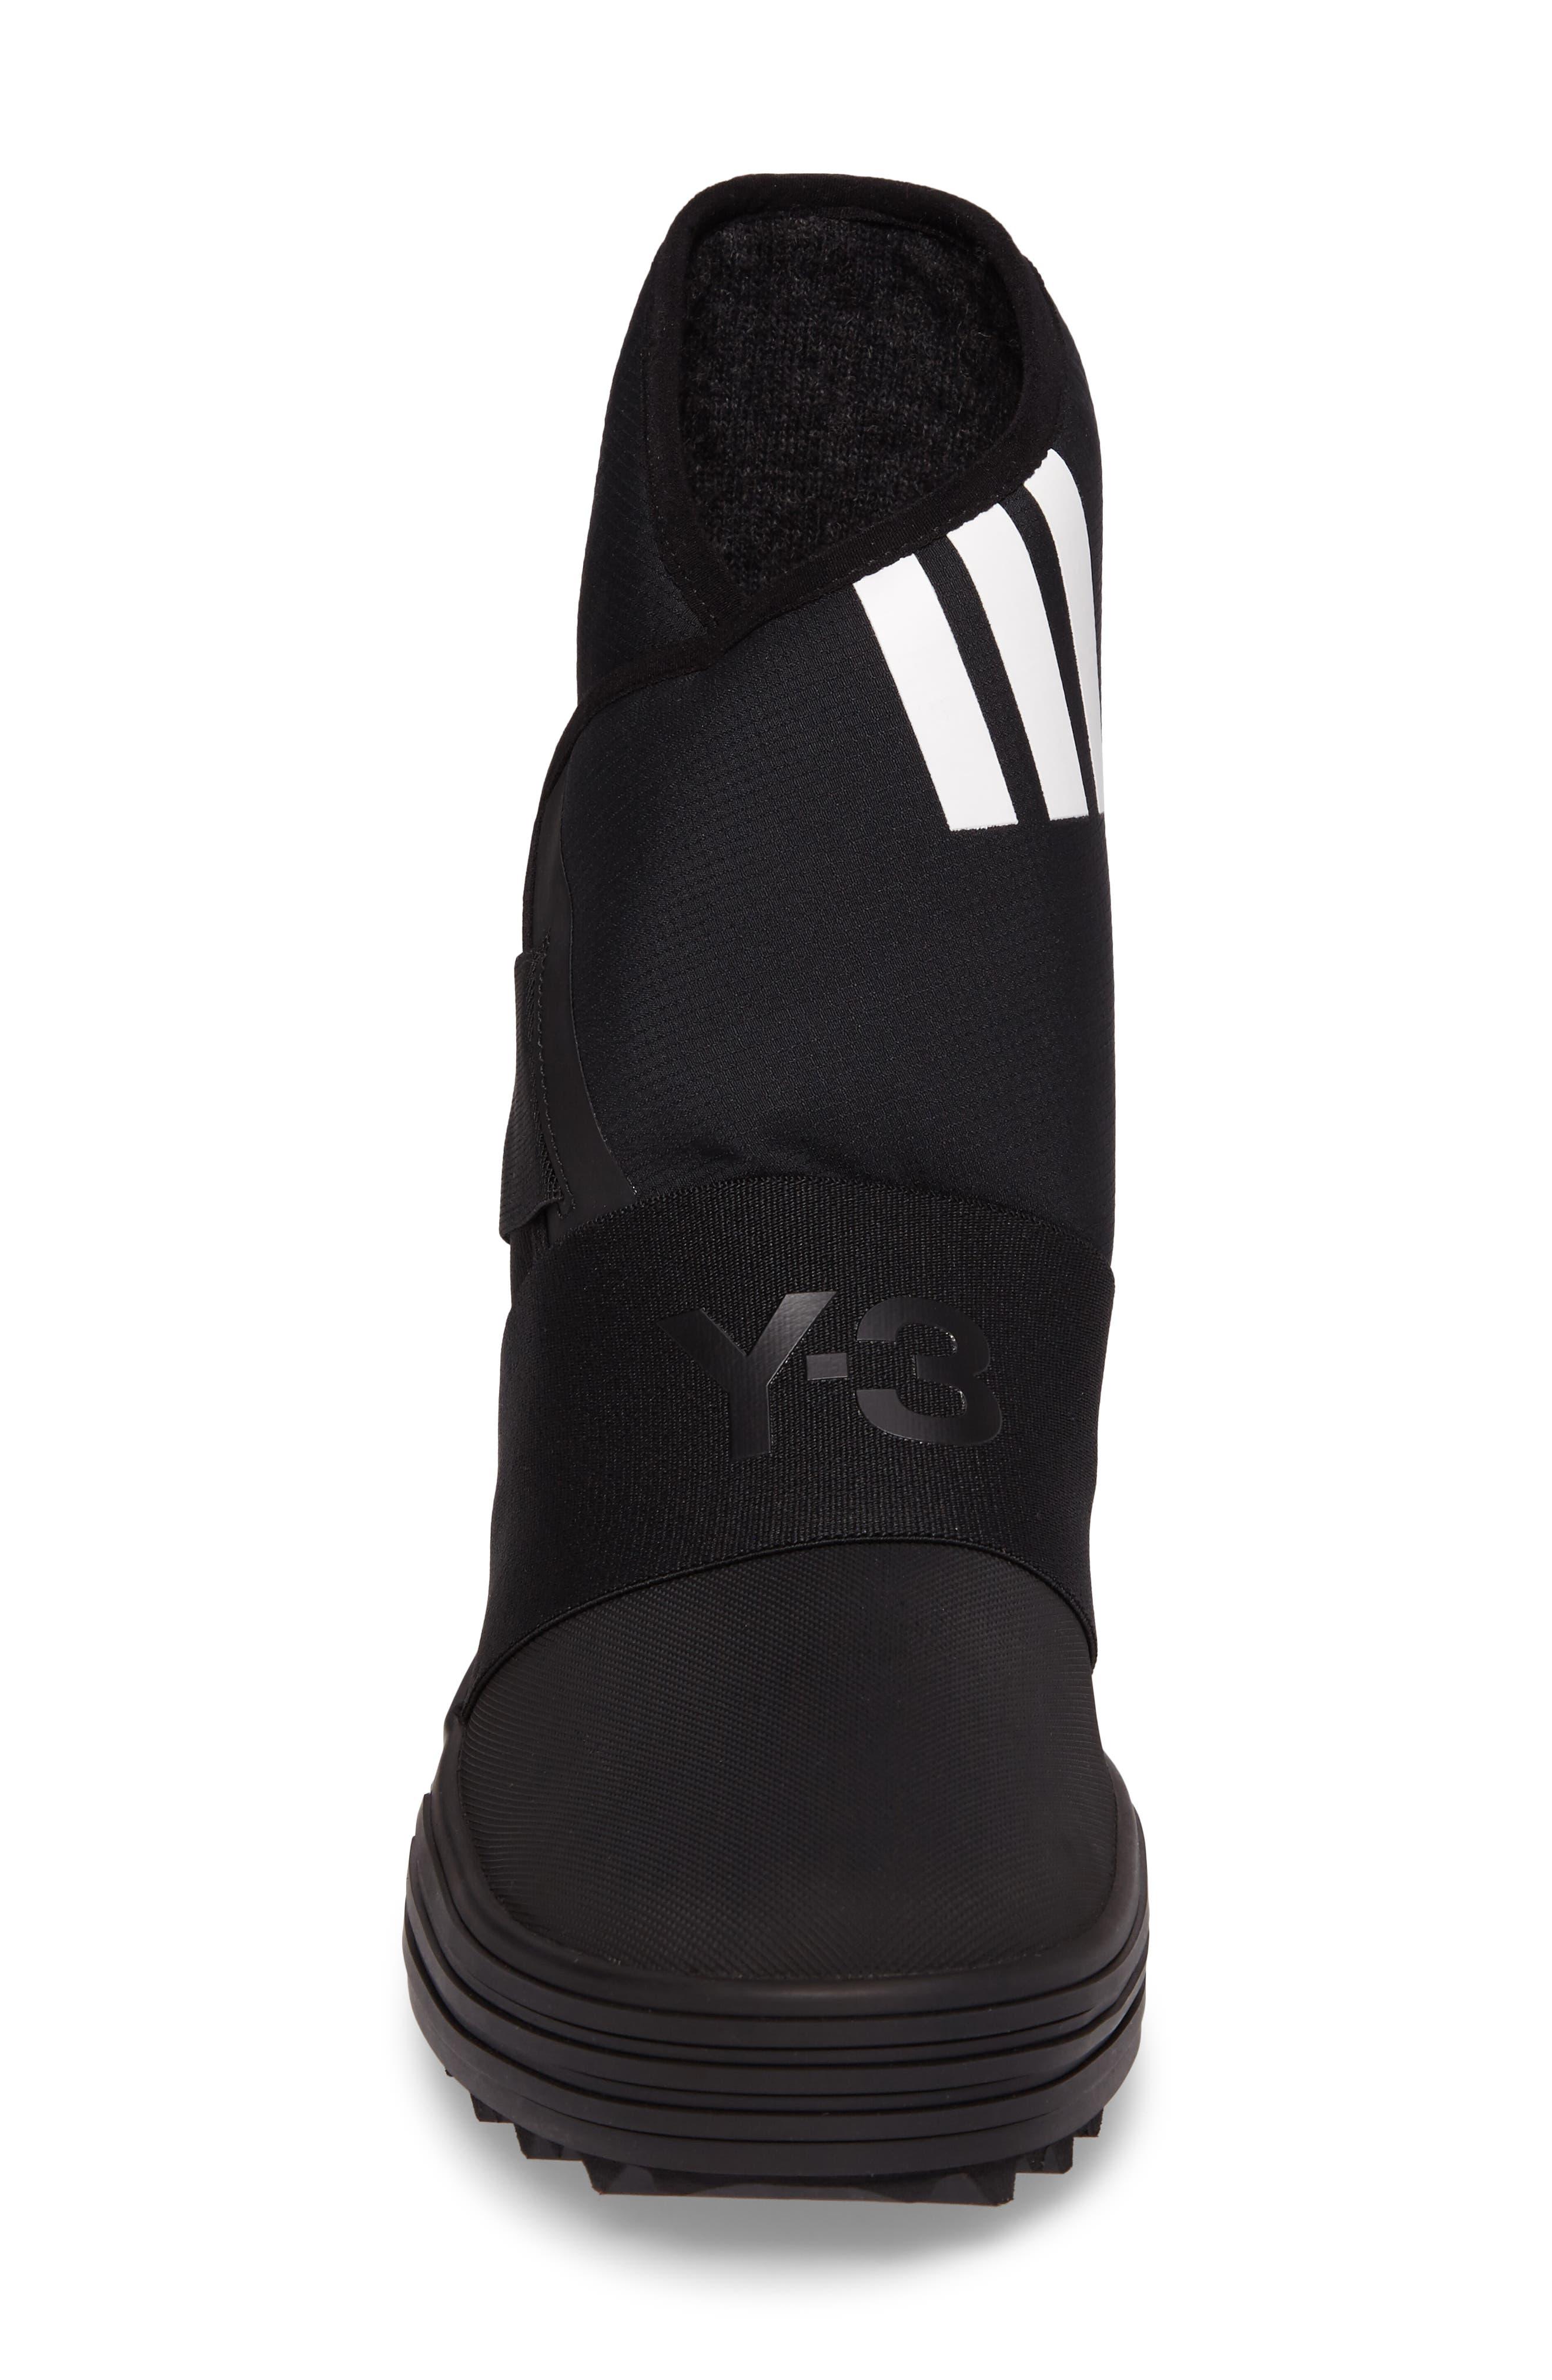 Sno Foxing High Top Sneaker,                             Alternate thumbnail 4, color,                             Core Black / White